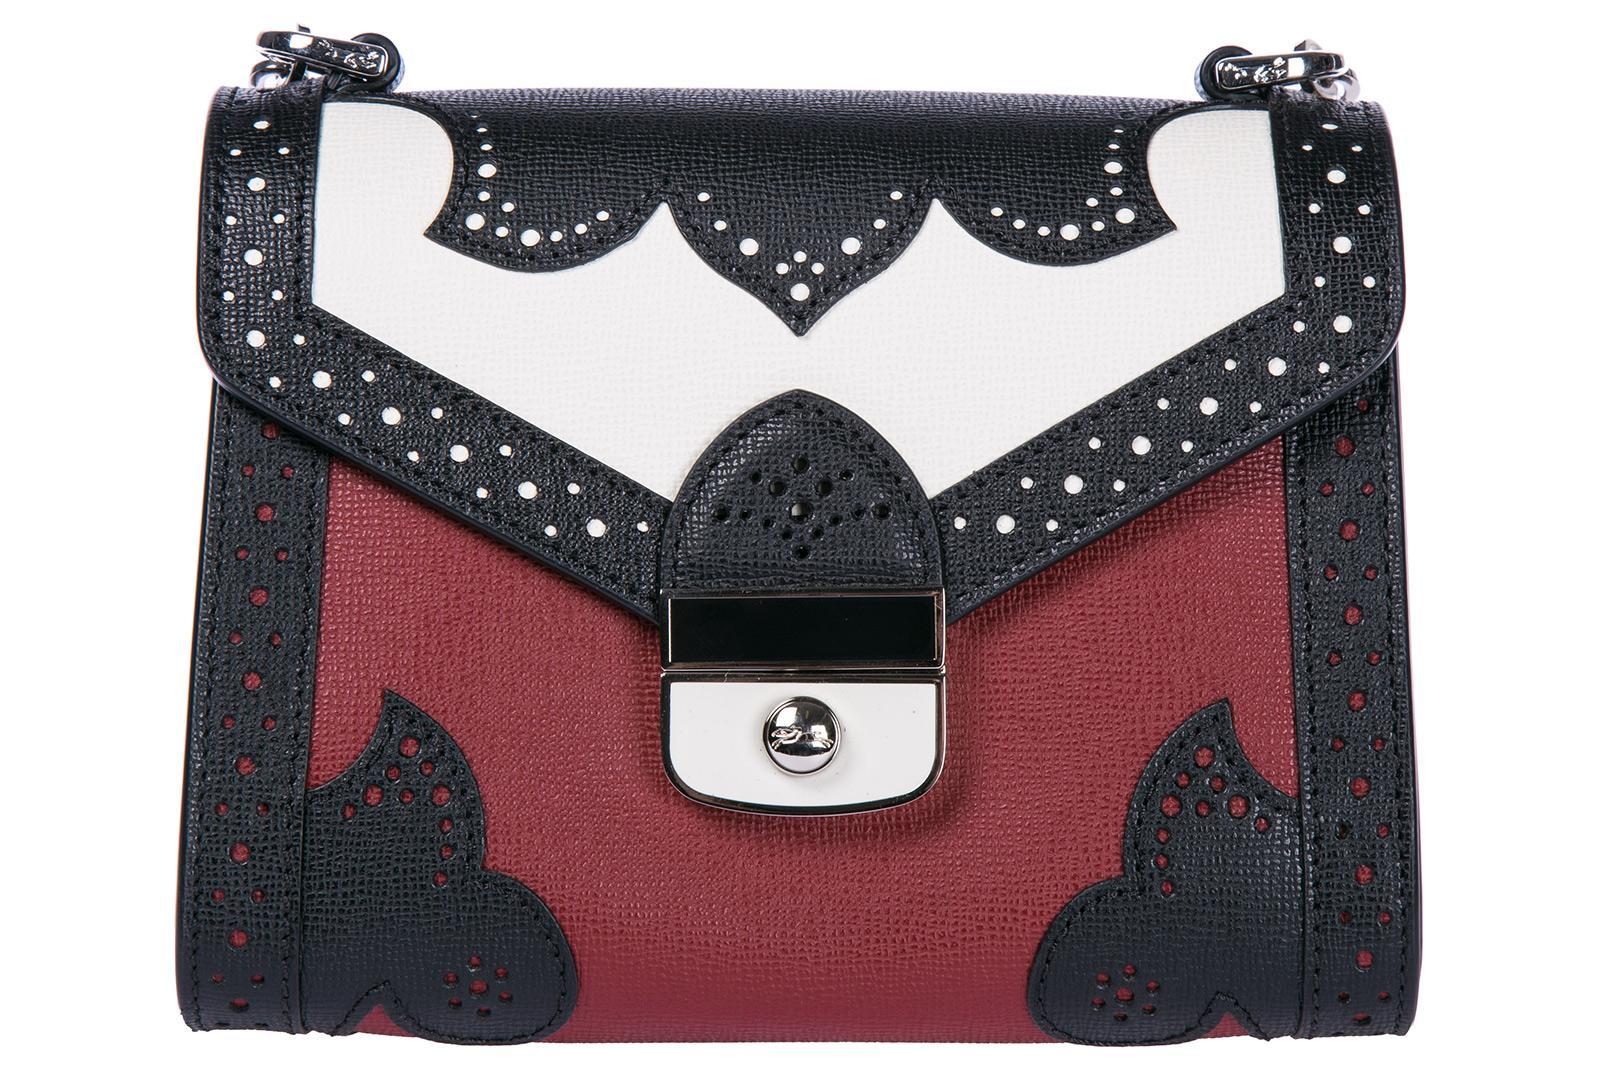 Longchamp Women's Leather Cross-body Messenger Shoulder Bag In Red